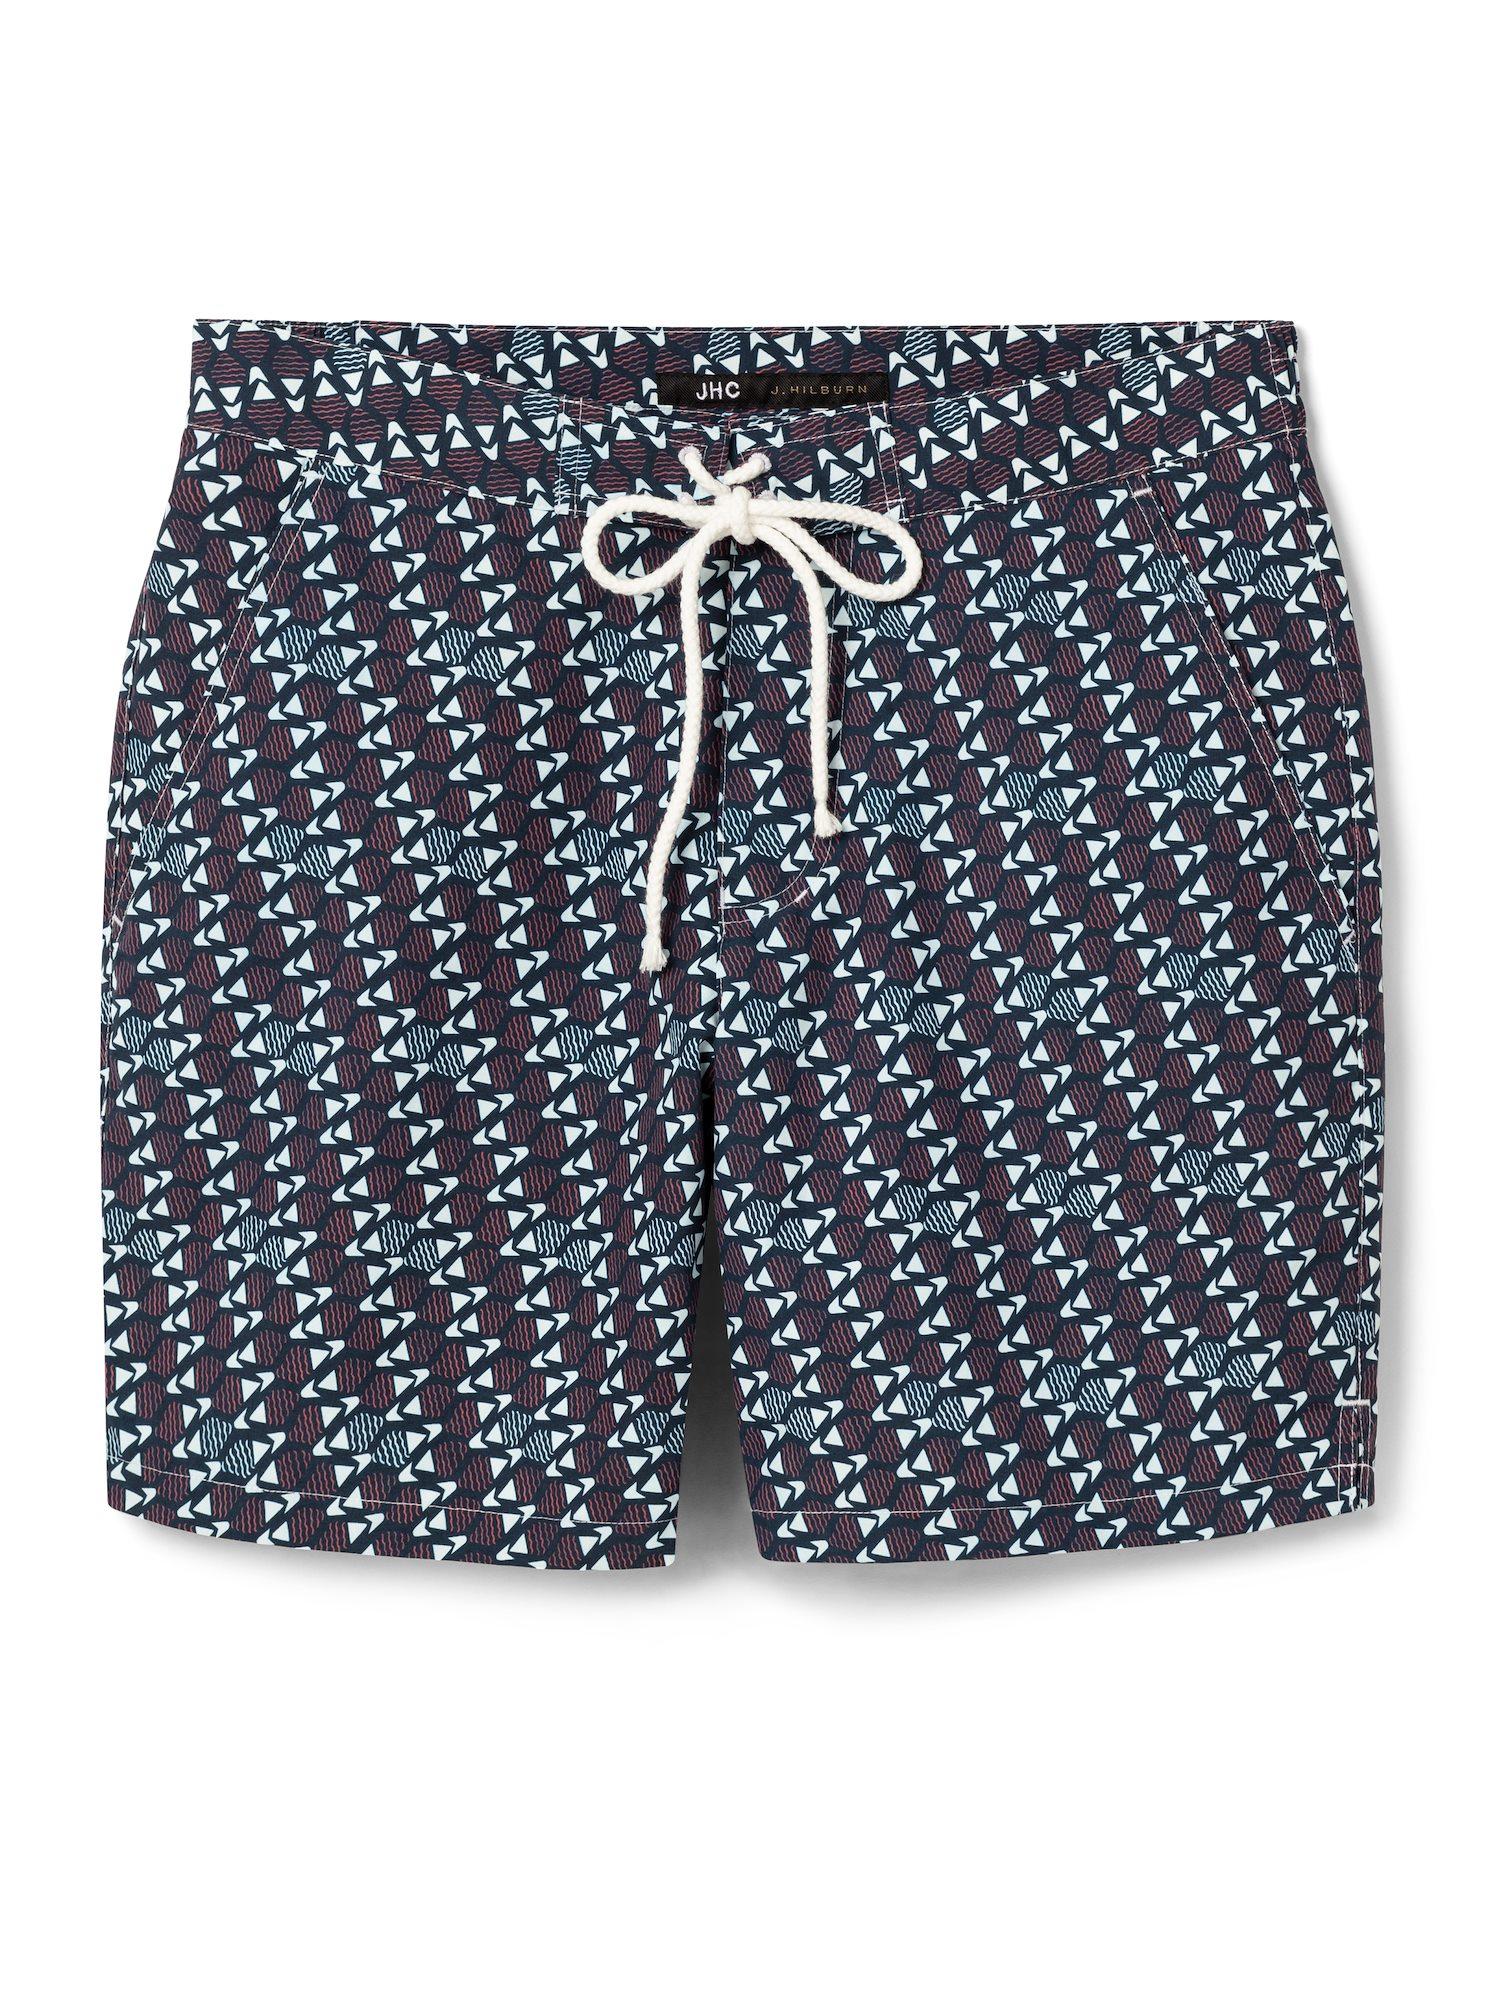 d5150b51b2 Navy/Coral Fish Swim Trunk. $148 $99 Add To Favorites